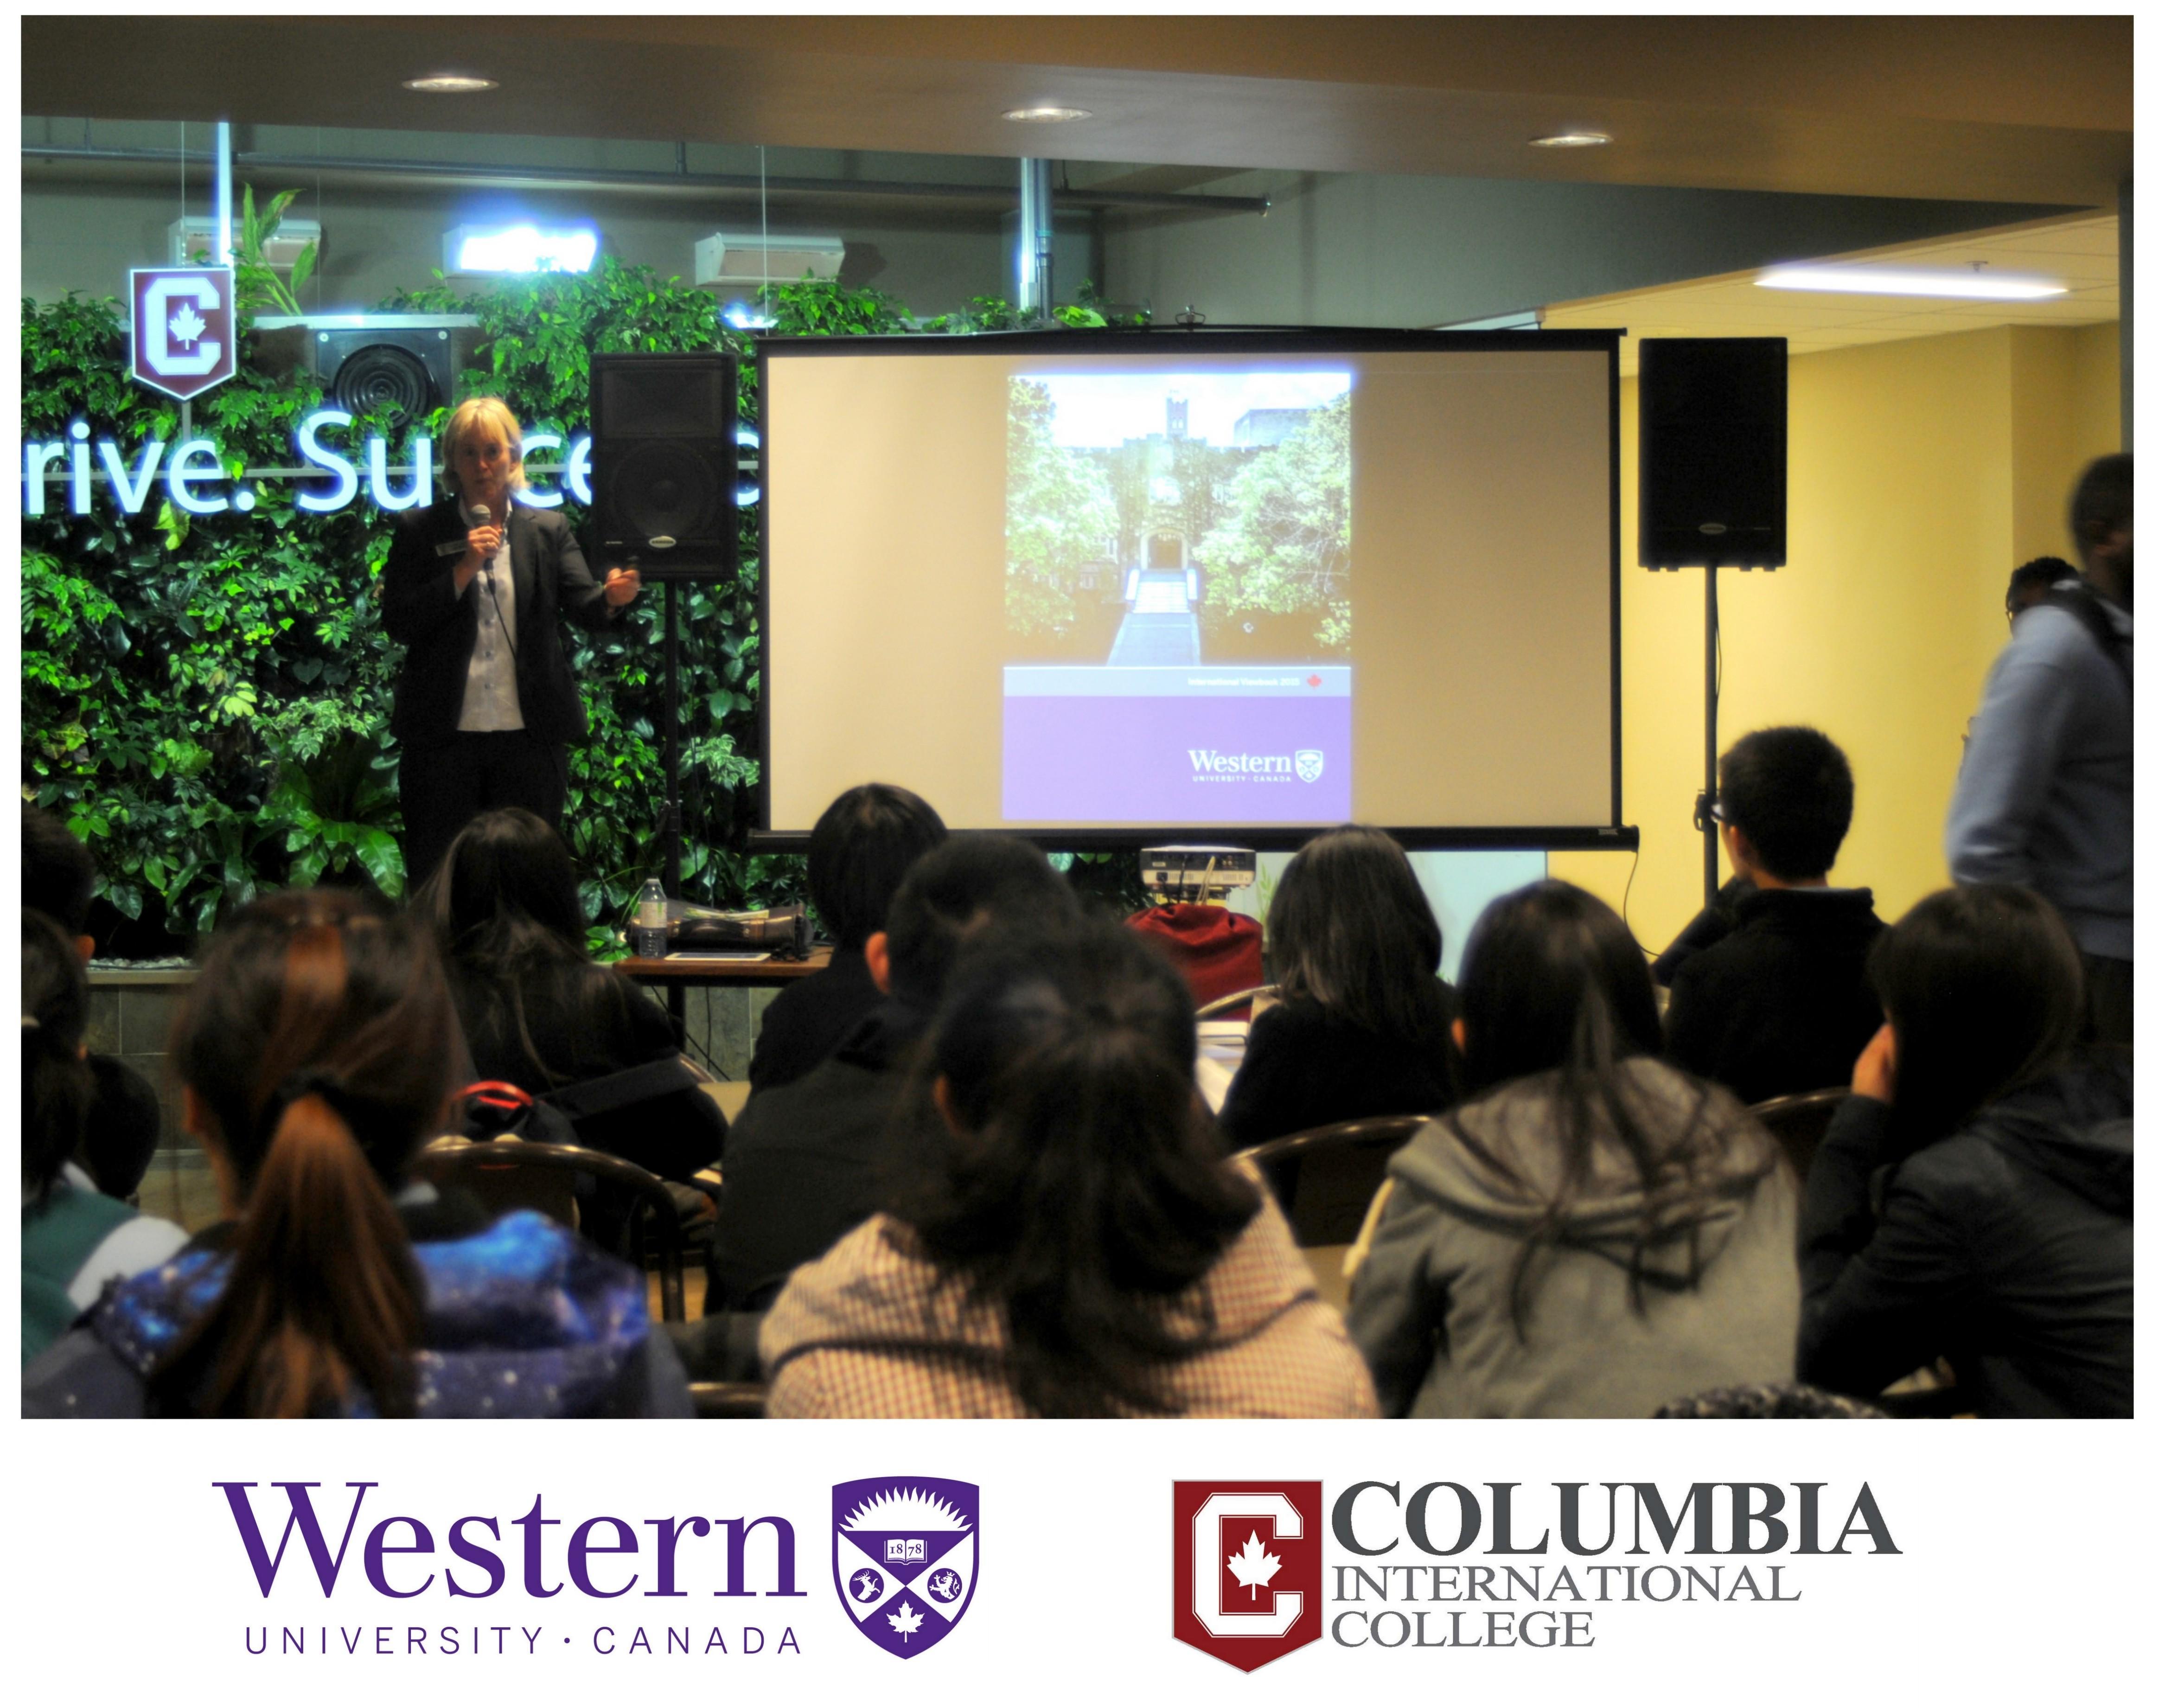 Columbia Welcomes Western U Columbia International College